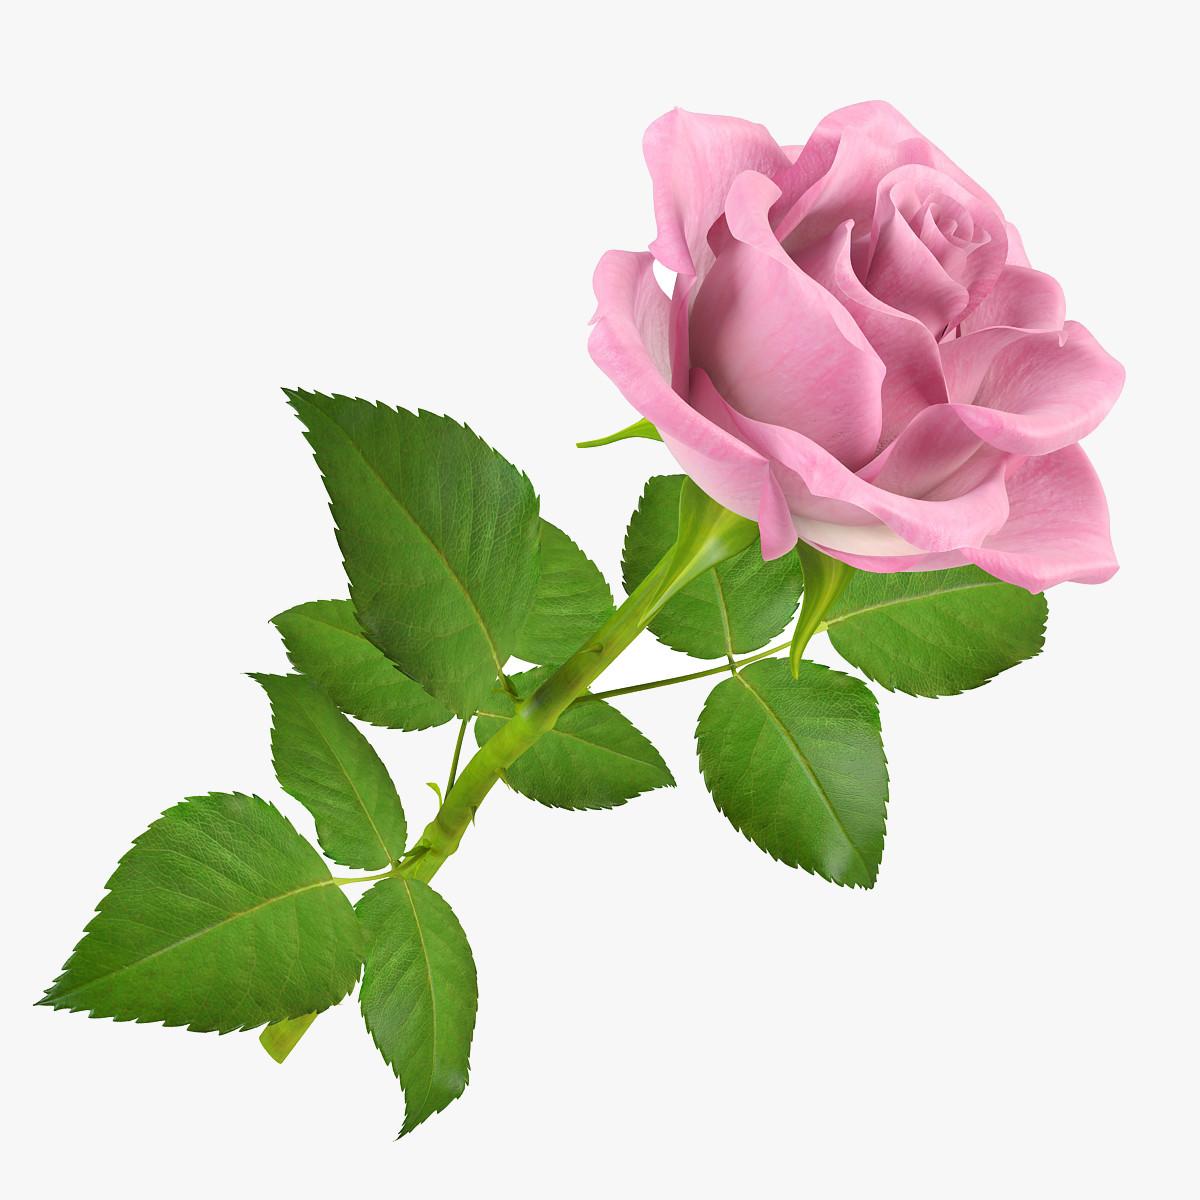 pr_rose6_1_1.jpg